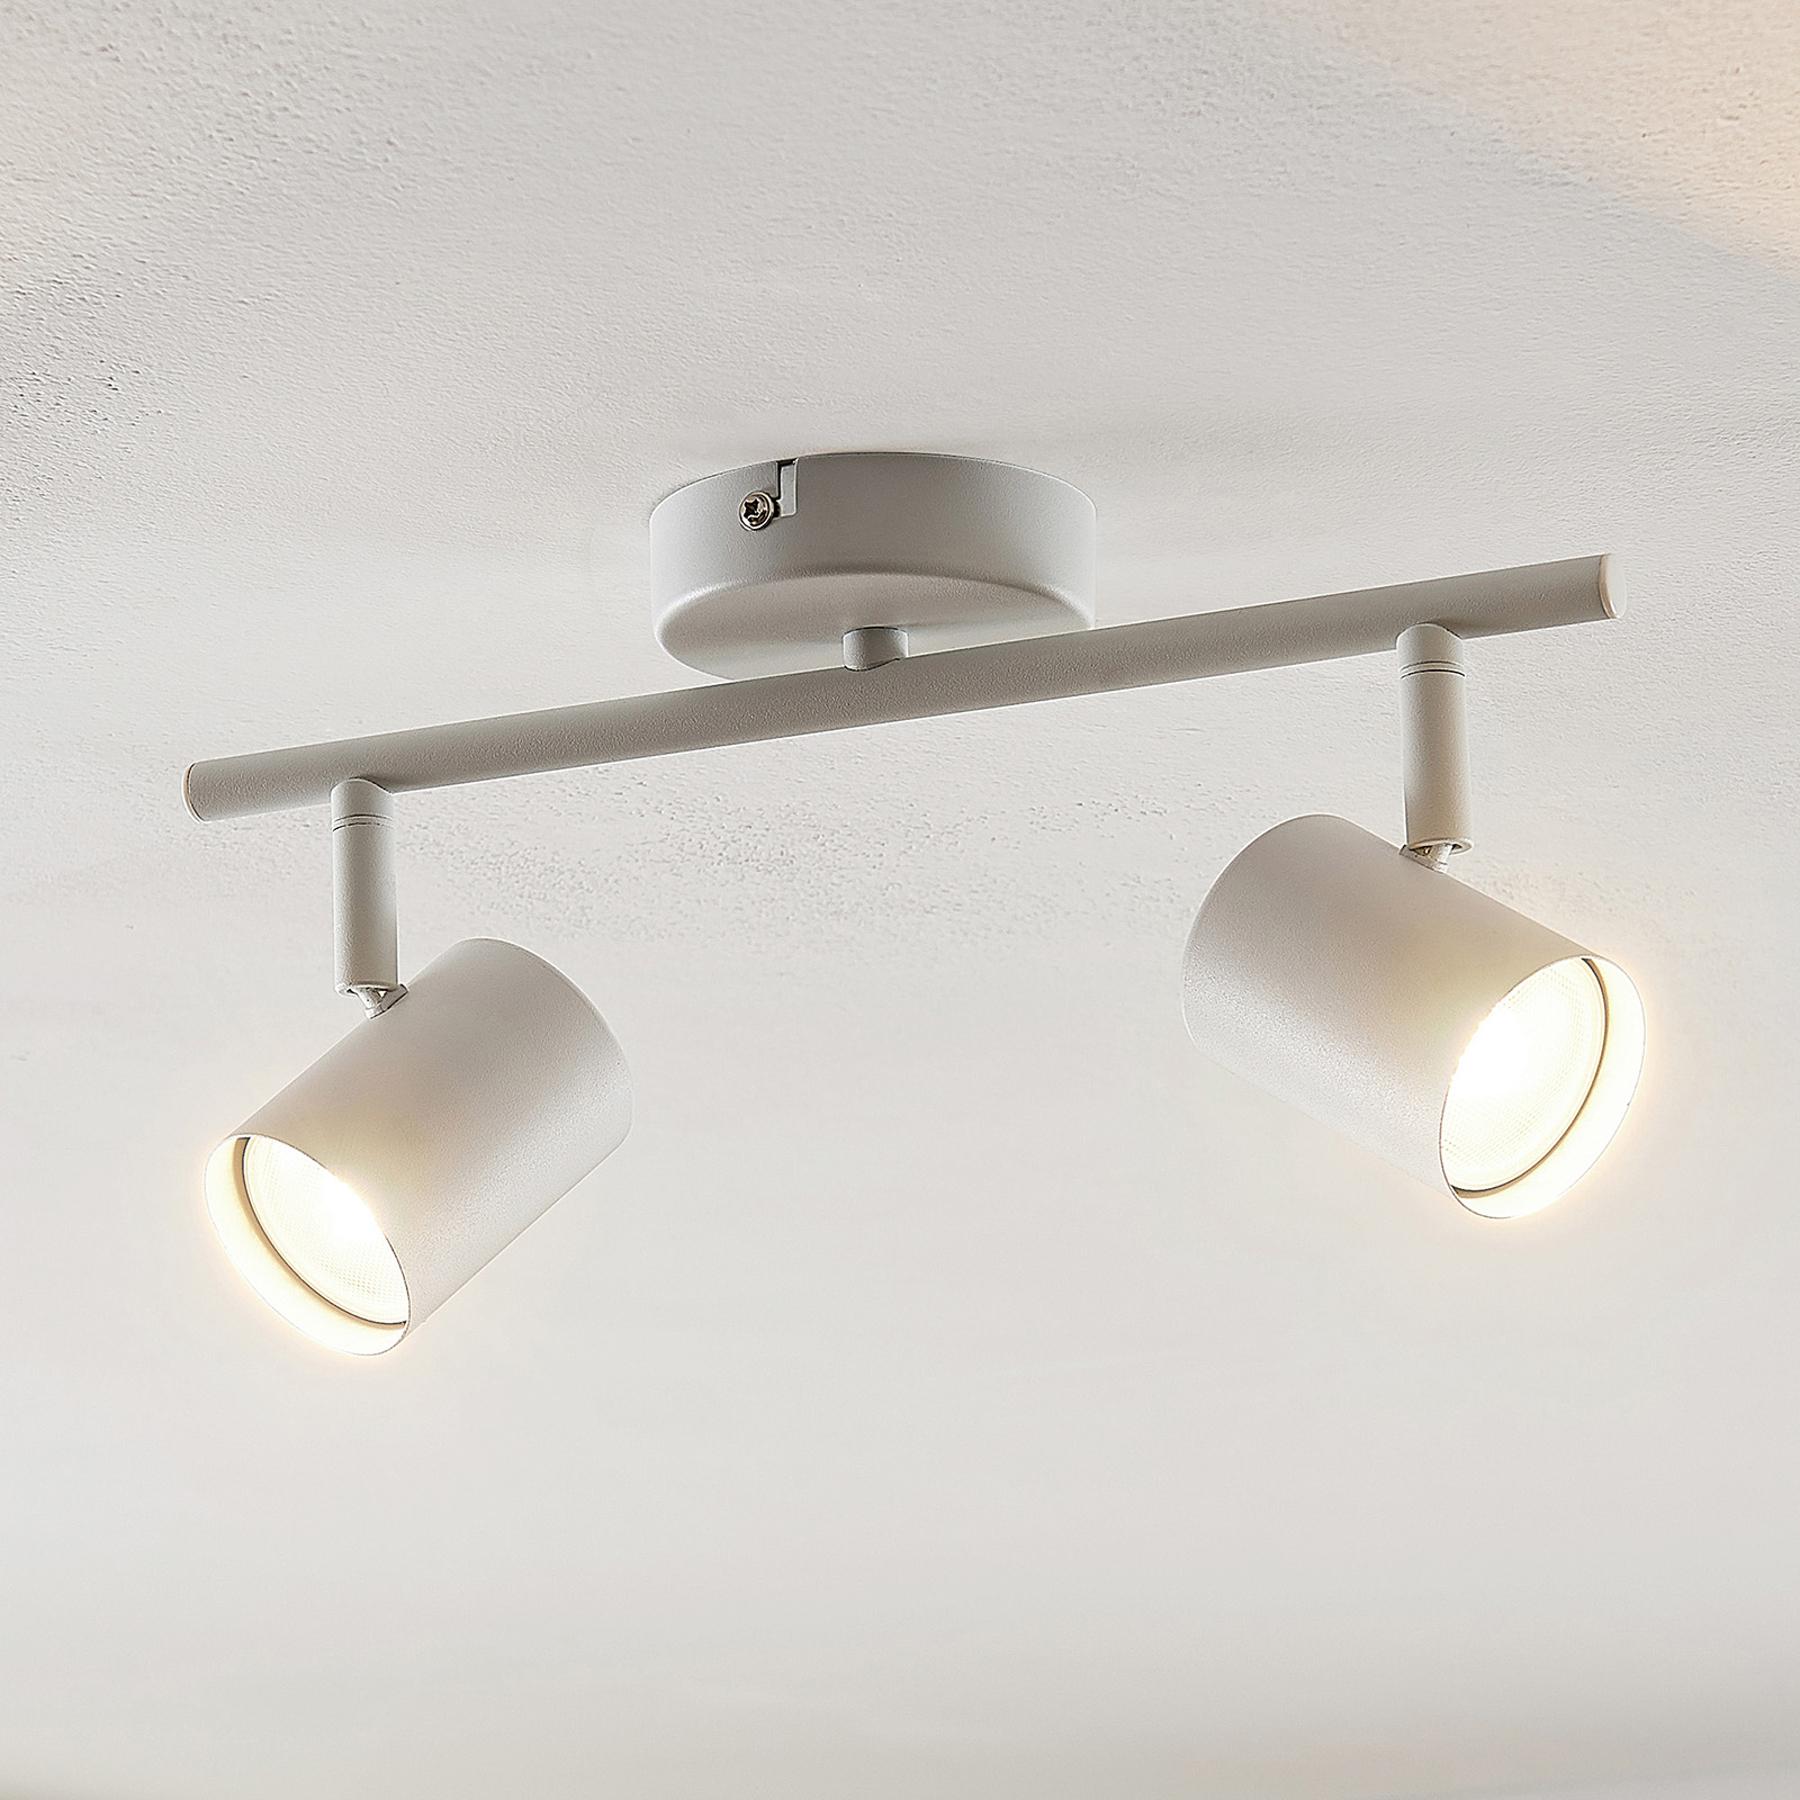 ELC Tomoki -LED-kohdevalo, valkoinen, 2-lamp.